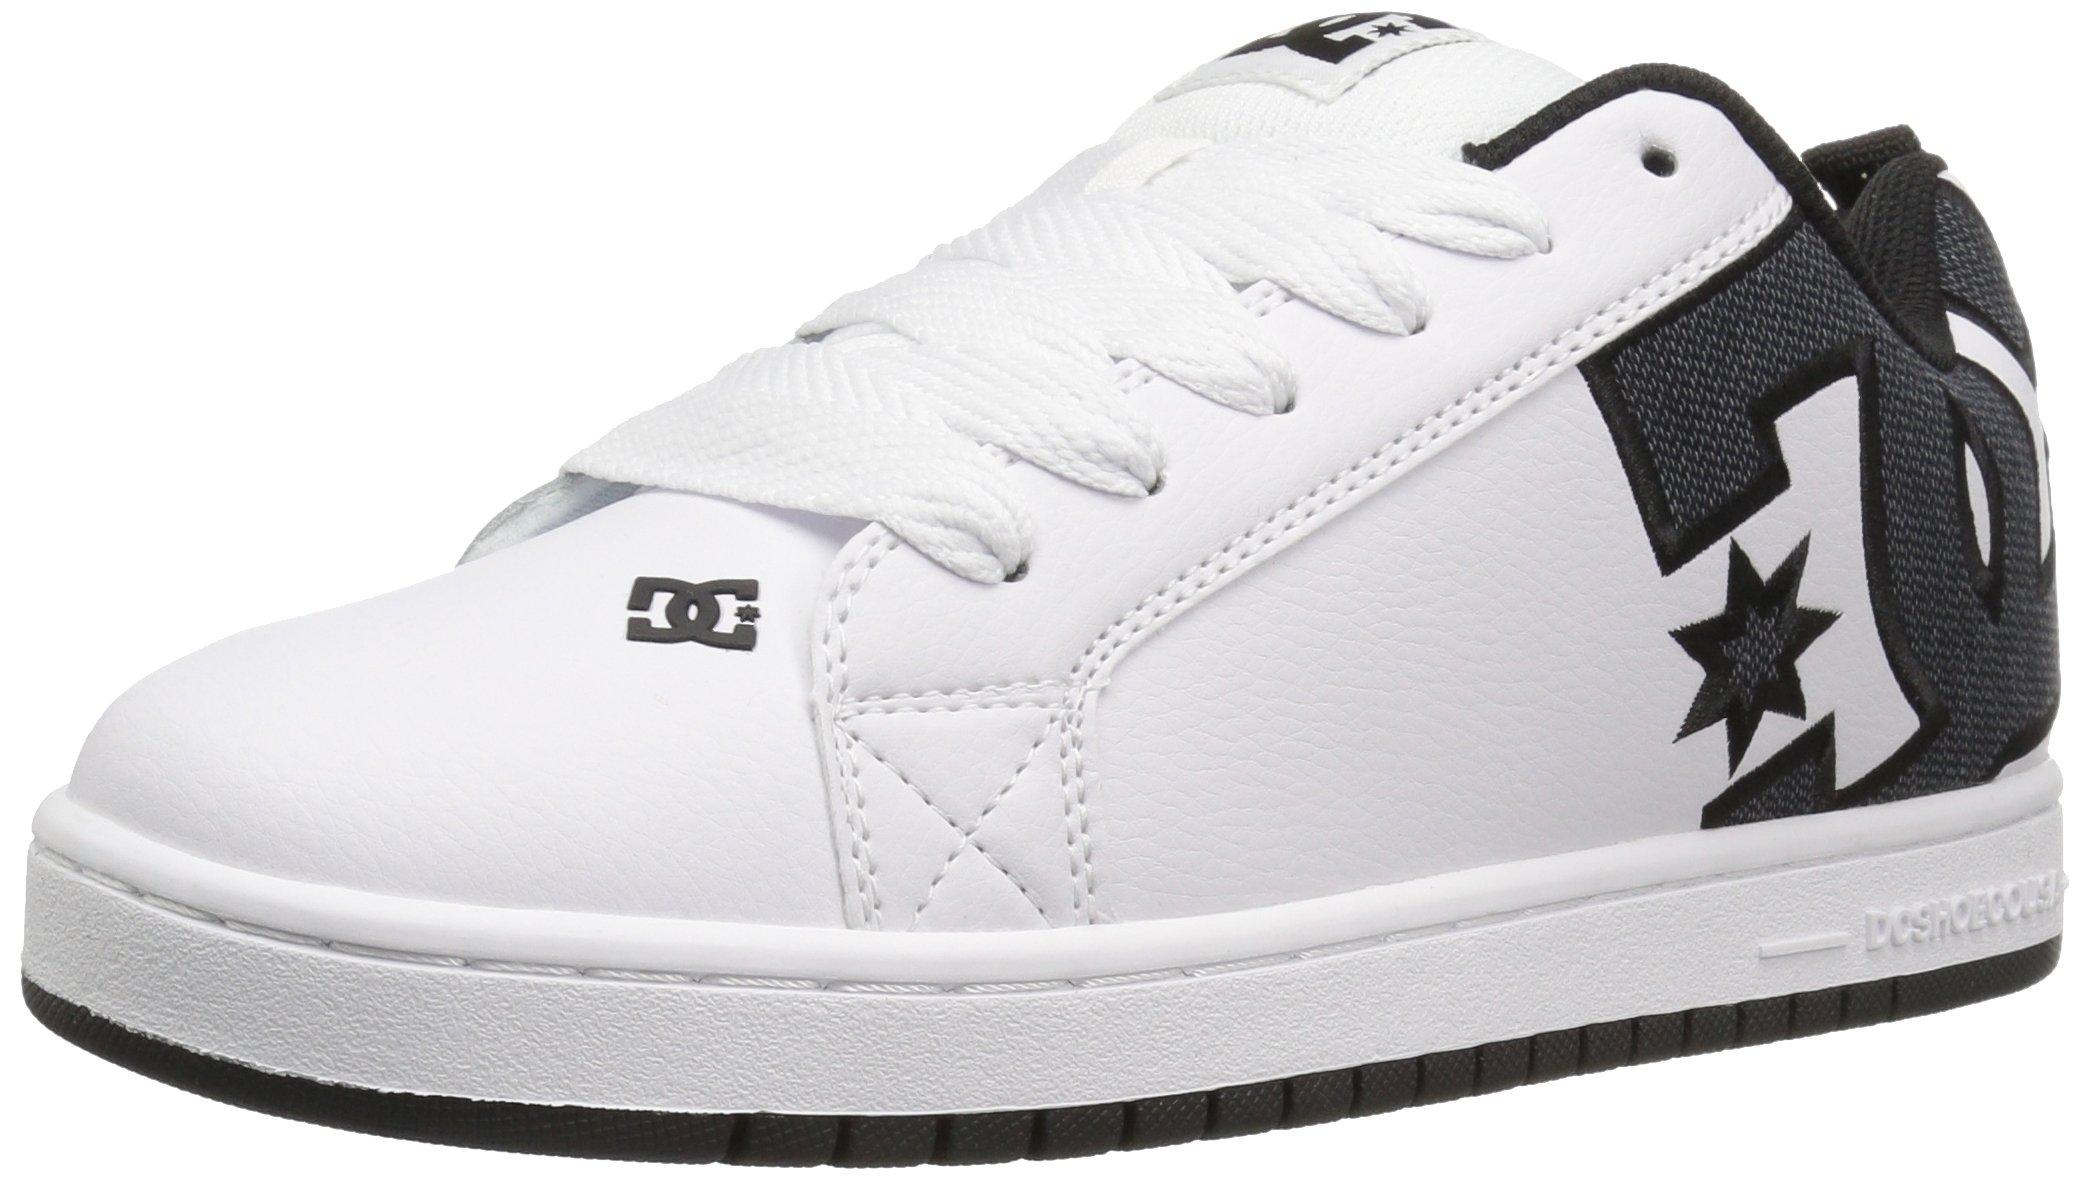 DC Men's Court Graffik SE Skate Shoe,White Smooth,6 D US